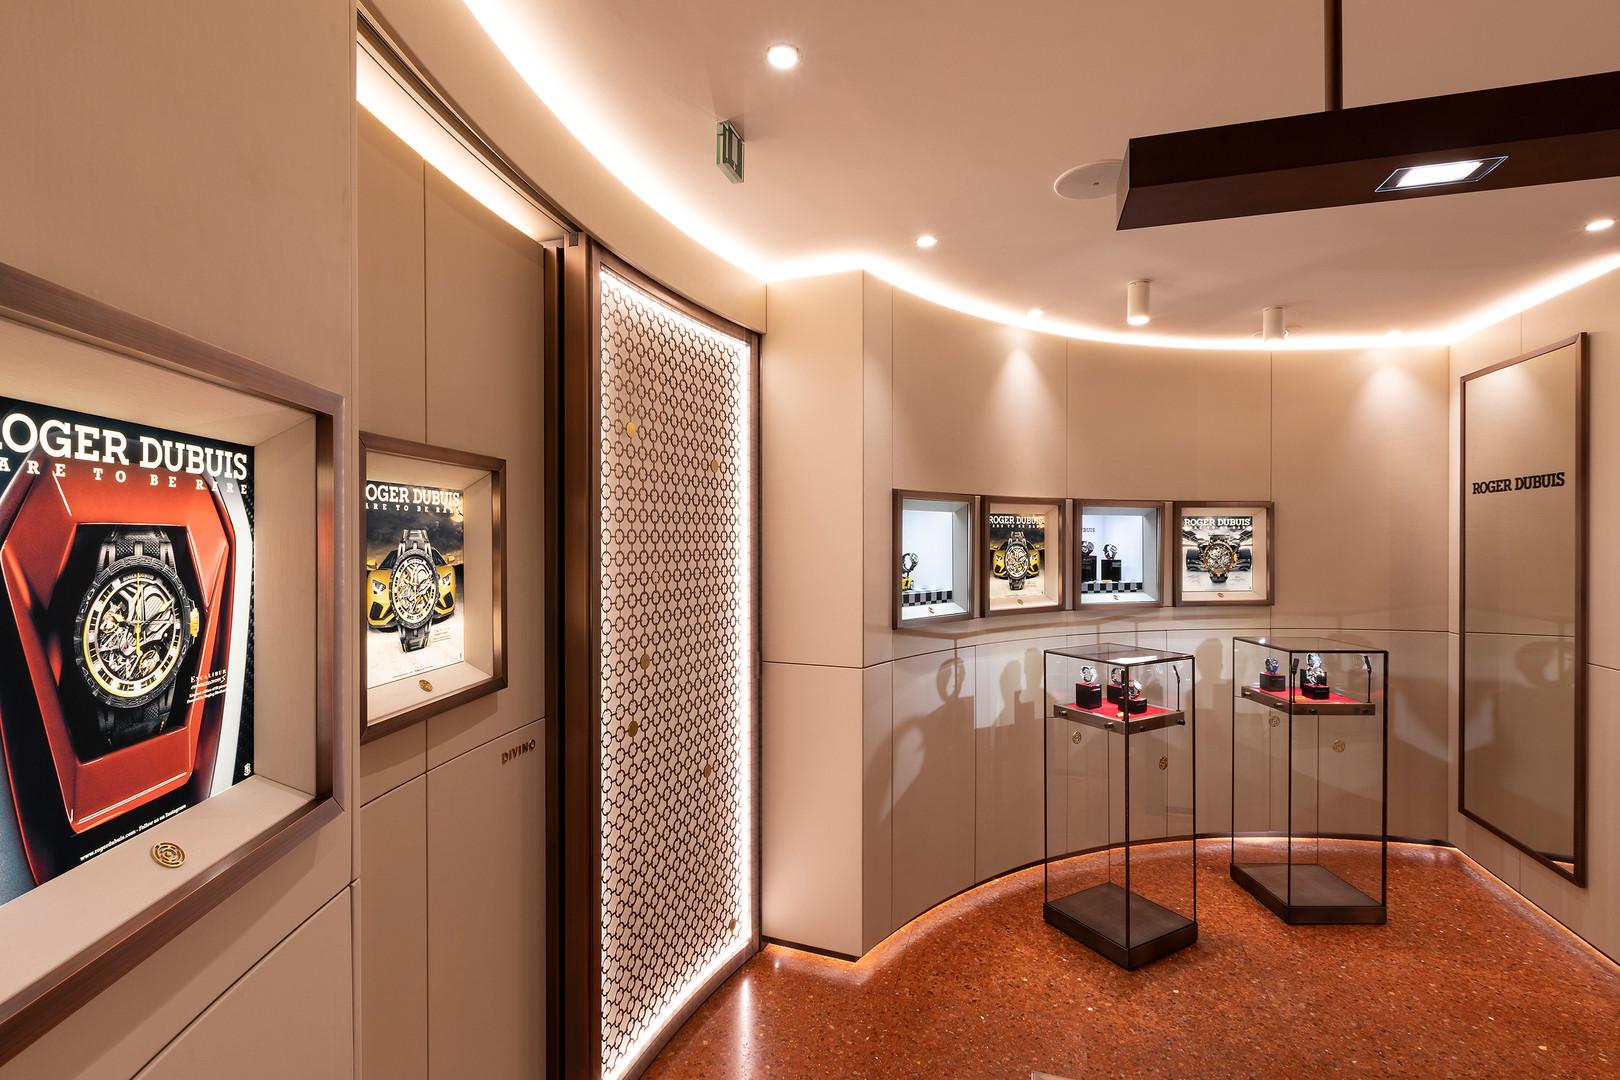 Boutique Roger Dubuis, Milan